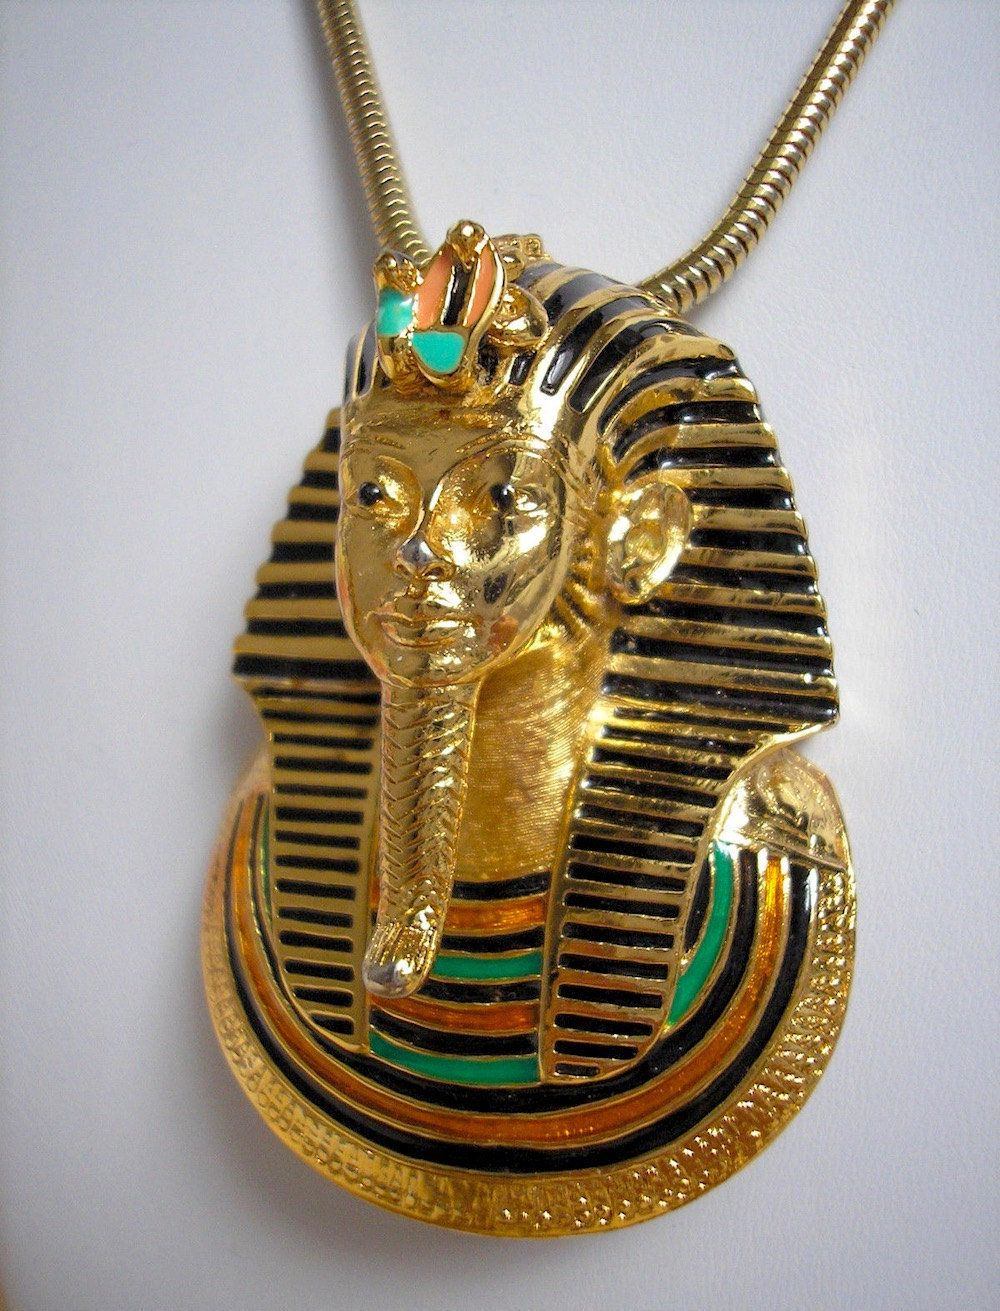 Egyptian King Tut Pendant Necklace